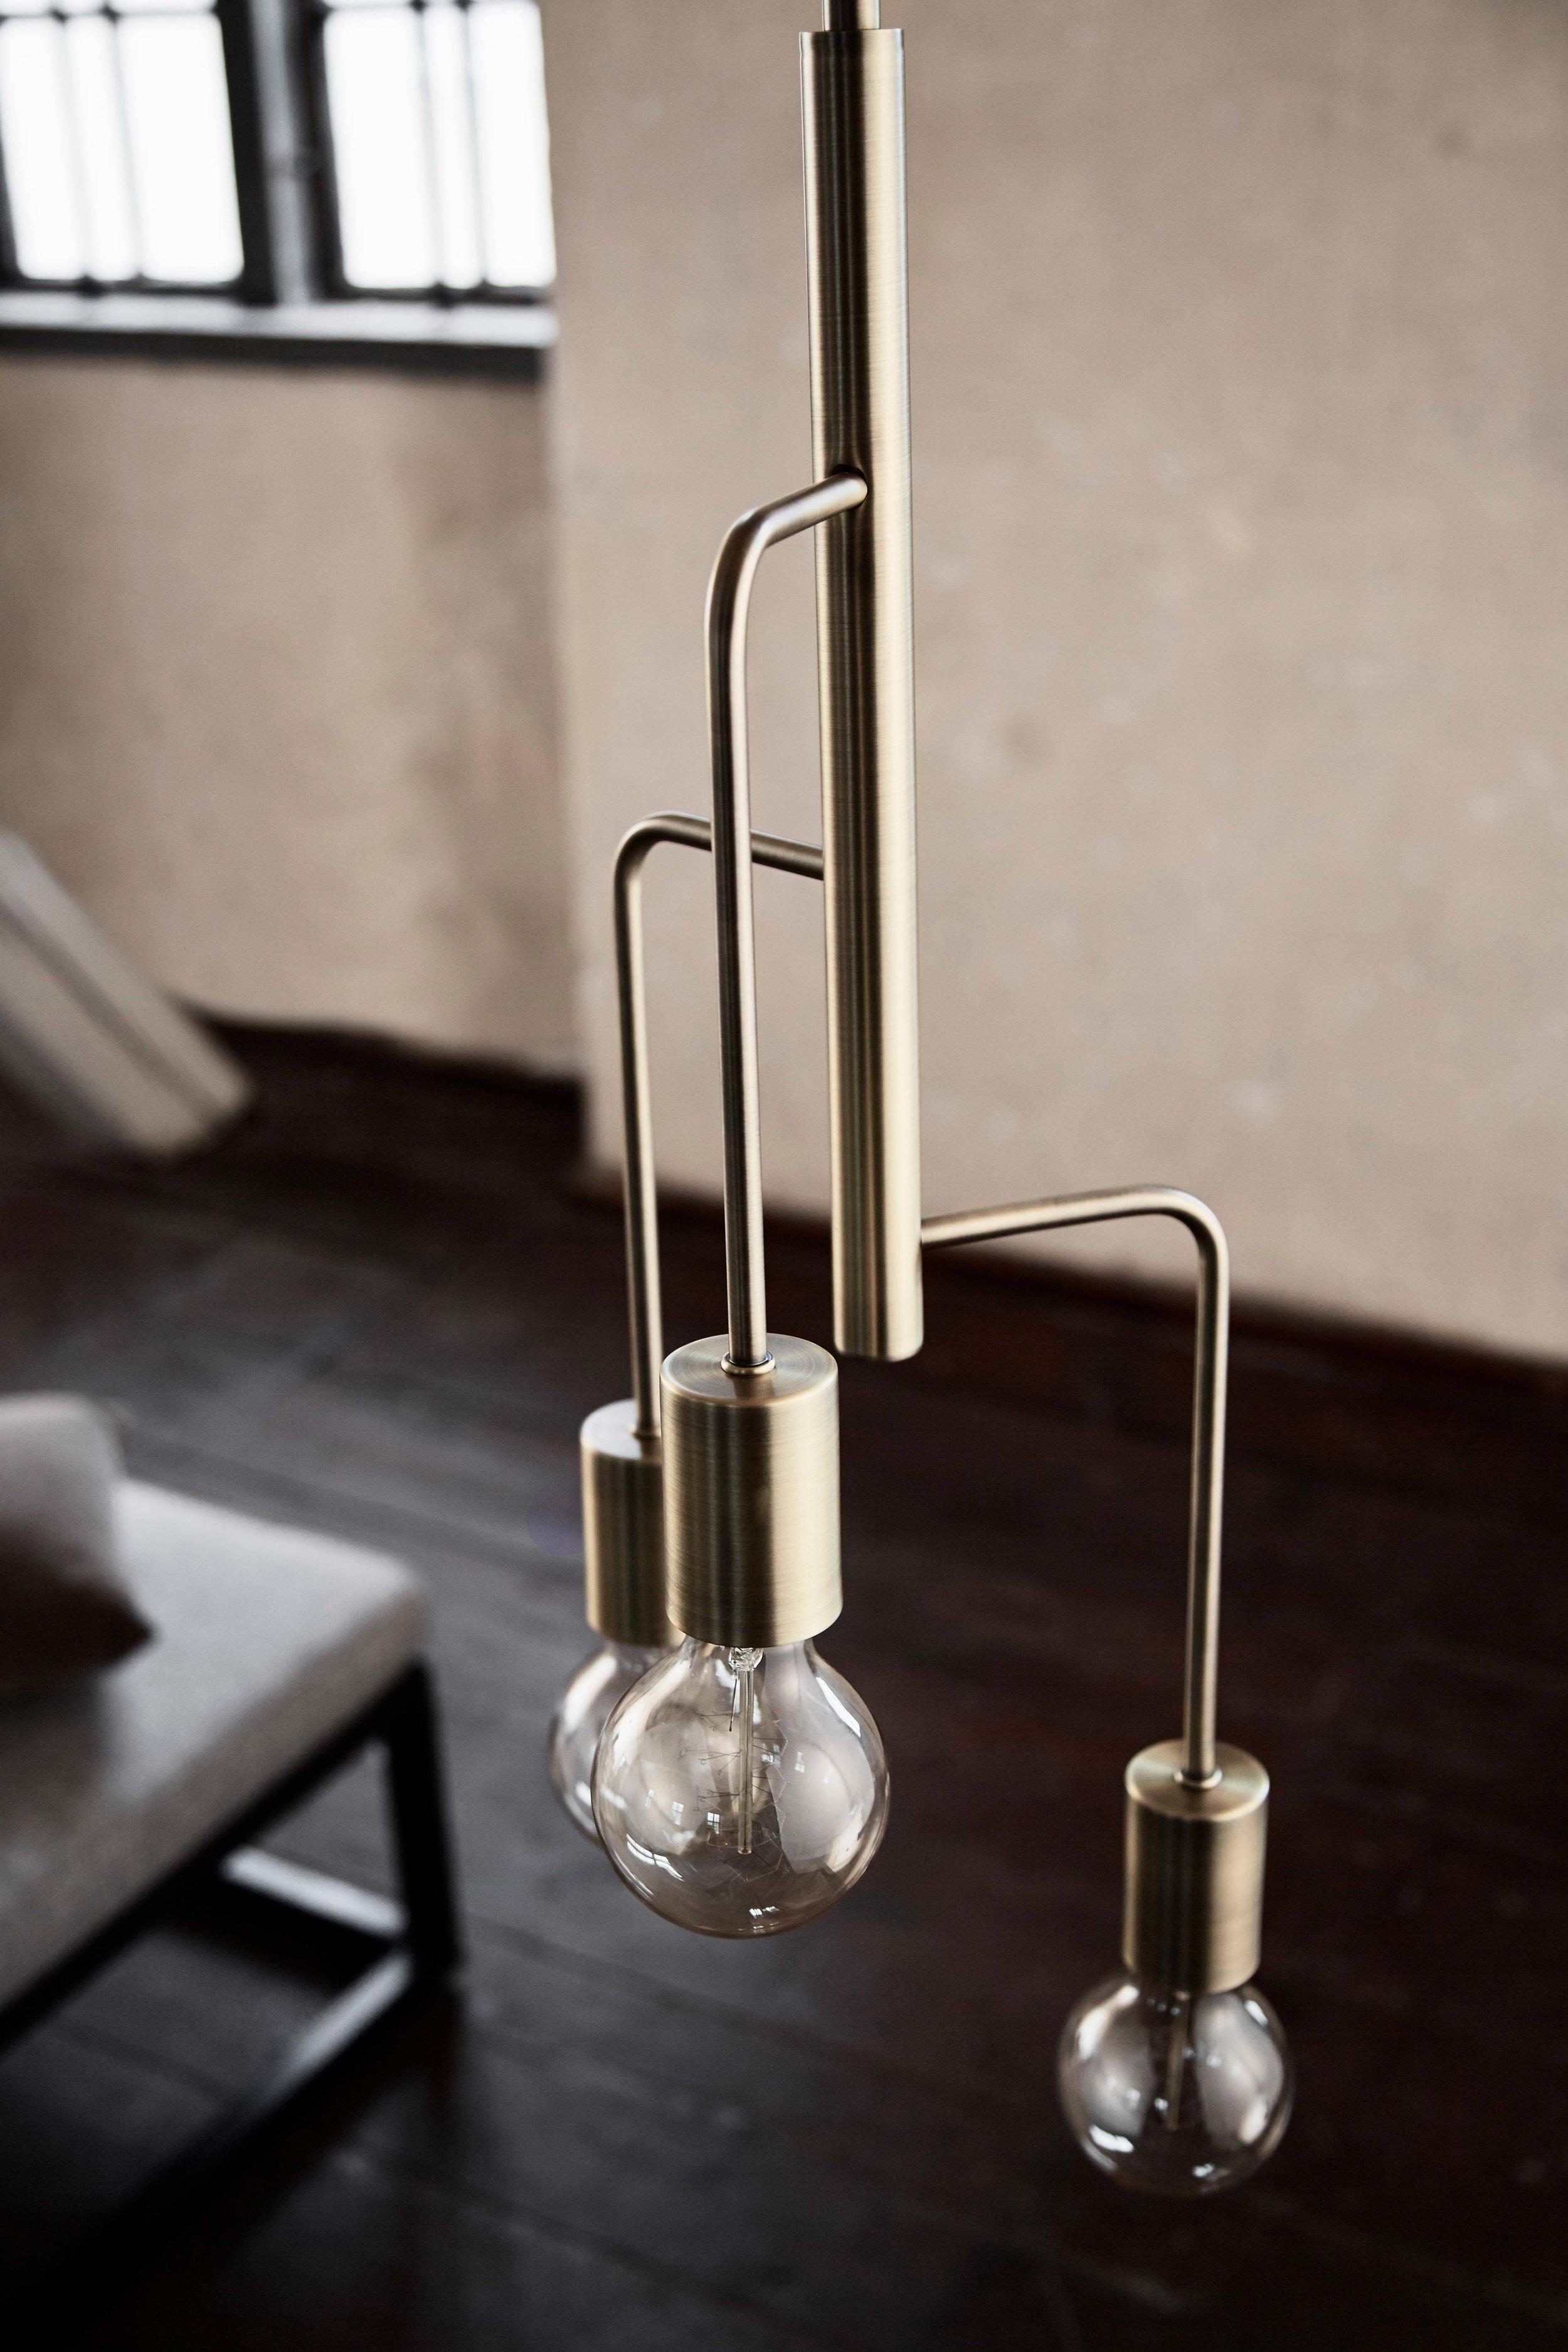 Cool-Chandelier---antique-brass---Lifestyle---Randers---CLOSE-UP_1.jpg